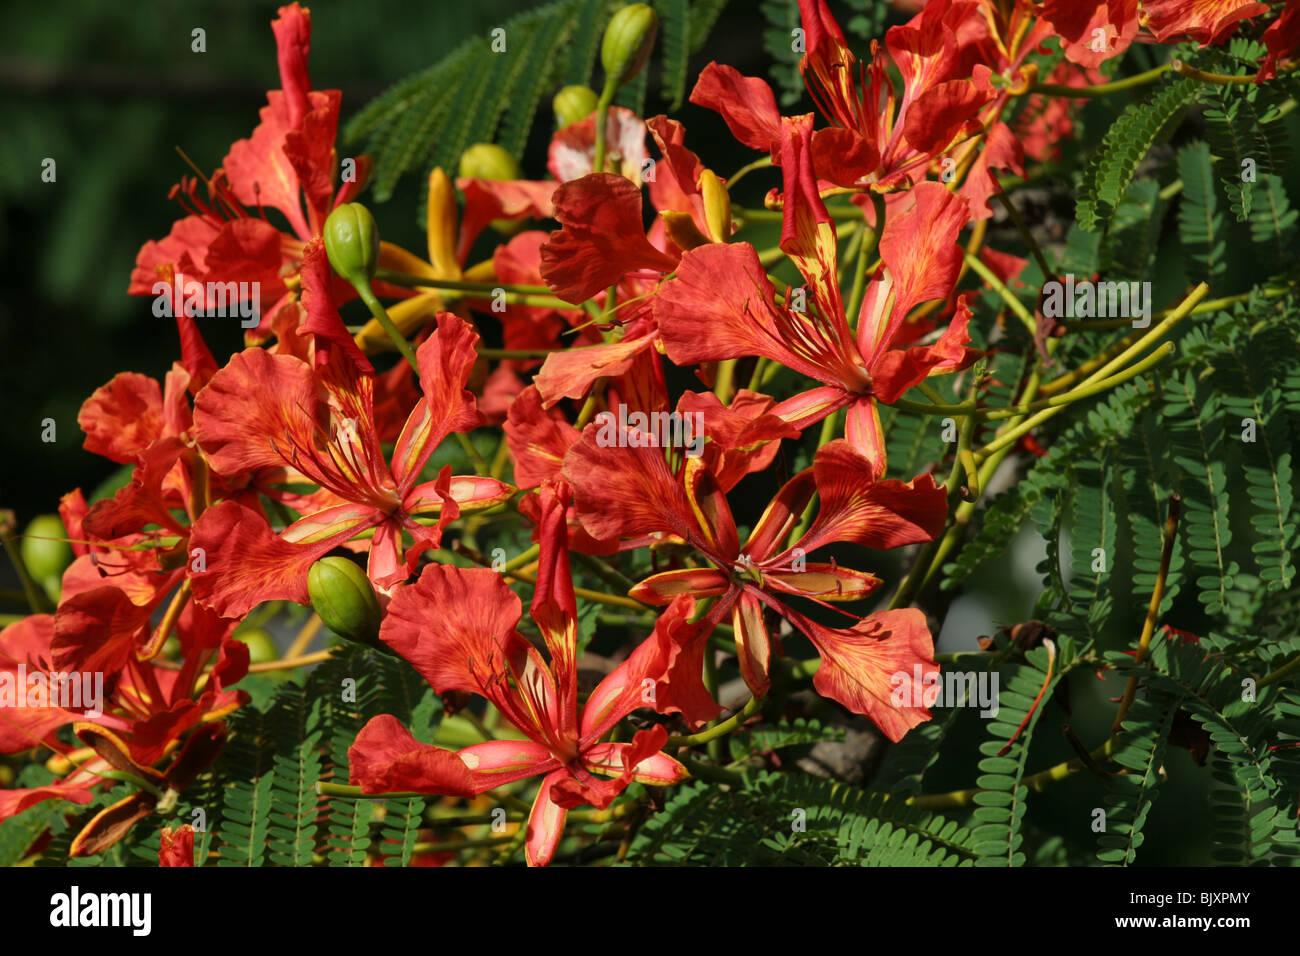 Jacaranda Flower Arusha Tanzania Tree Stock Photo 28862763 Alamy